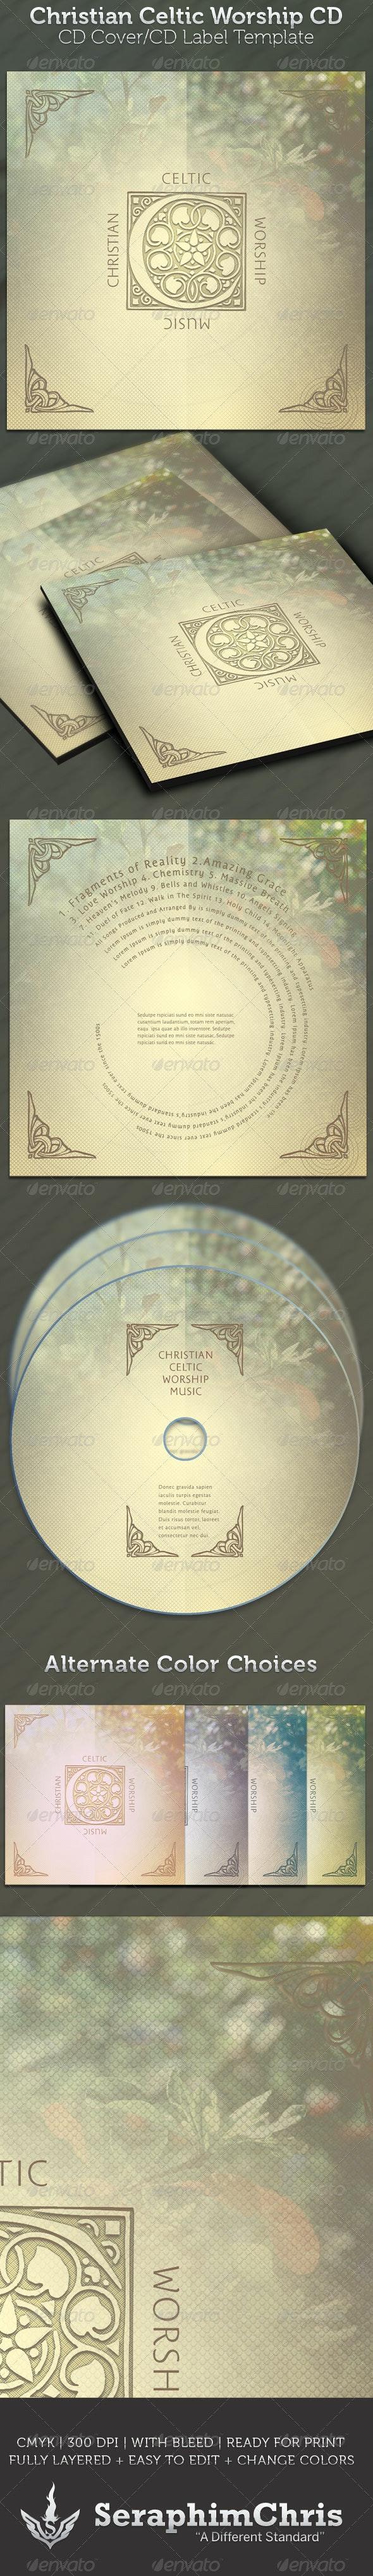 Celtic Christian Worship CD - CD & DVD Artwork Print Templates